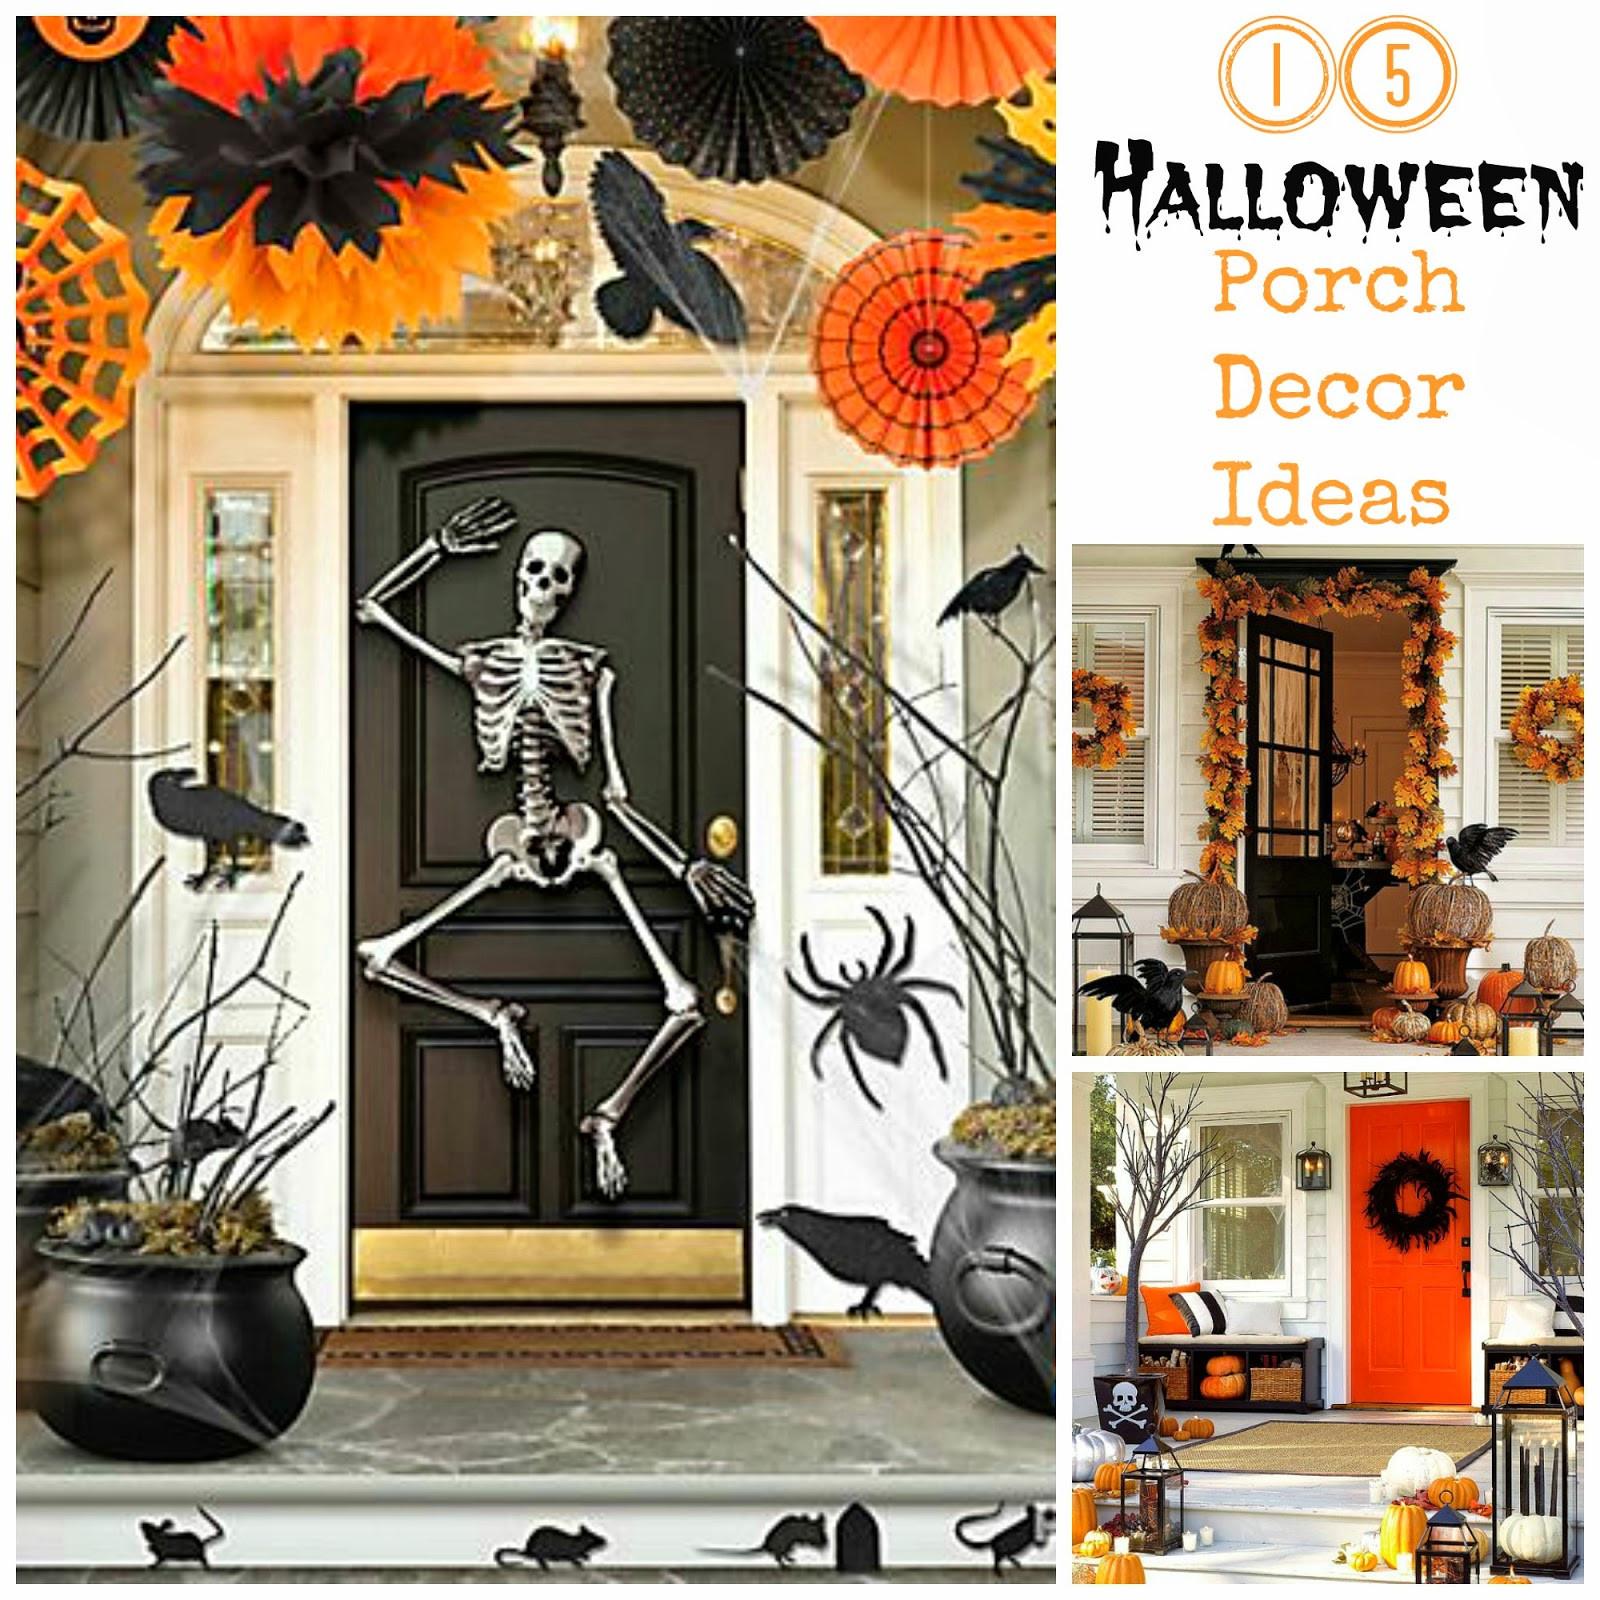 Porch Decorations For Halloween  15 Halloween Porch Decor Ideas I Dig Pinterest